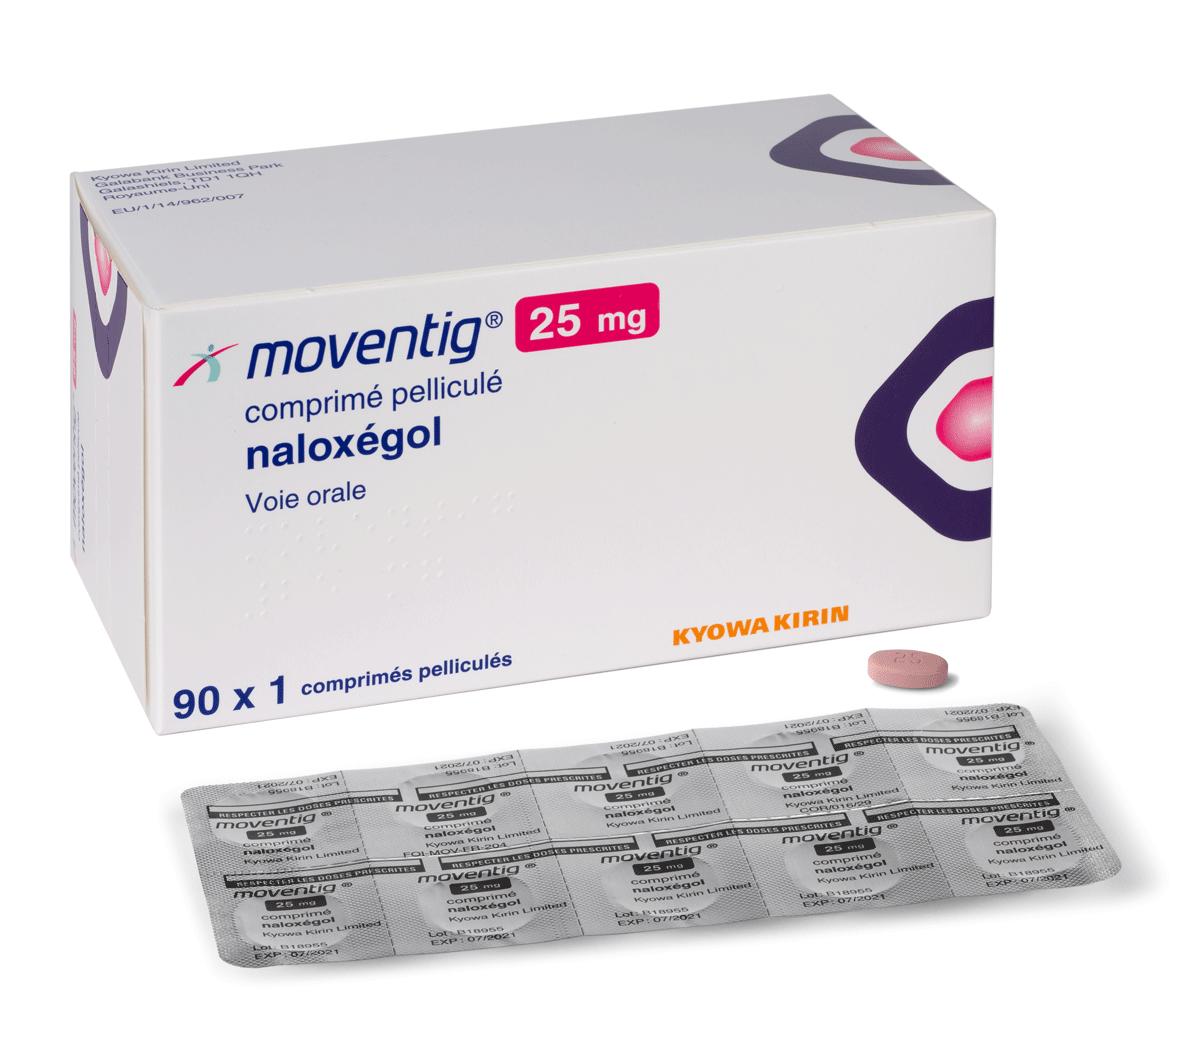 Image MOVENTIG 25 mg Cpr pell Plq/90x1